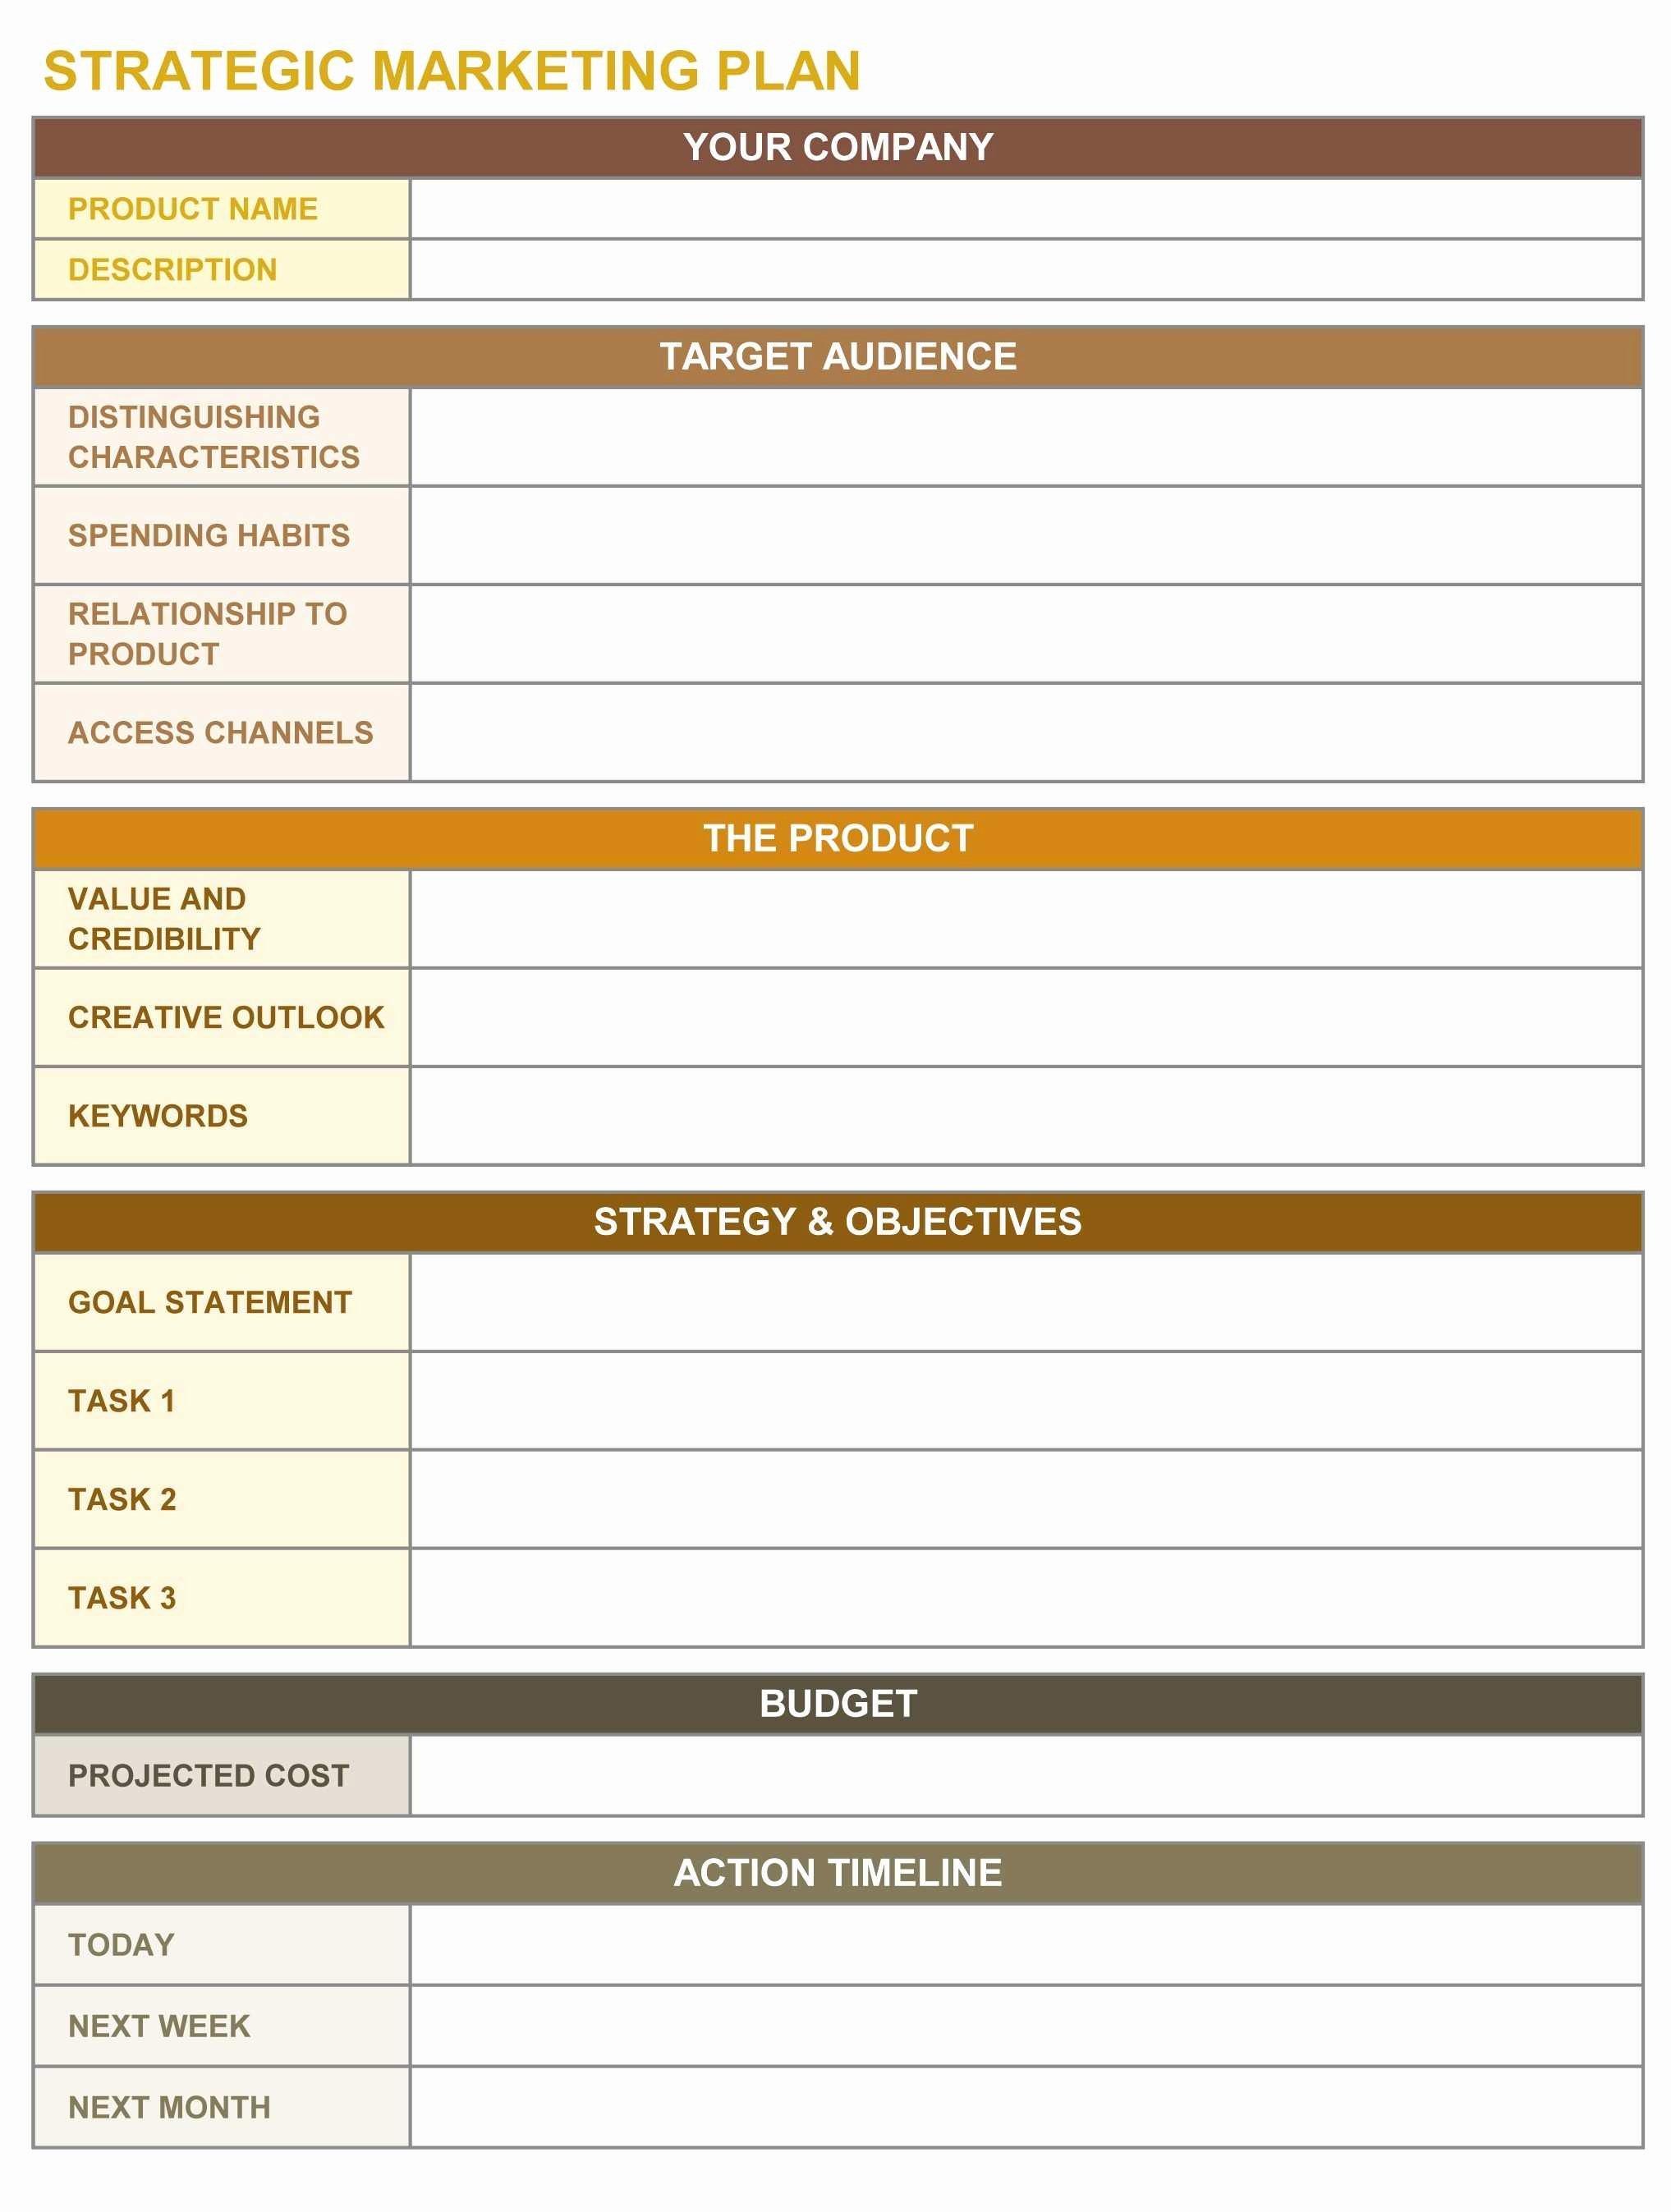 Strategic Plan Template Nonprofit Inspirational Inspirational Strategic Planning Template Non Profit